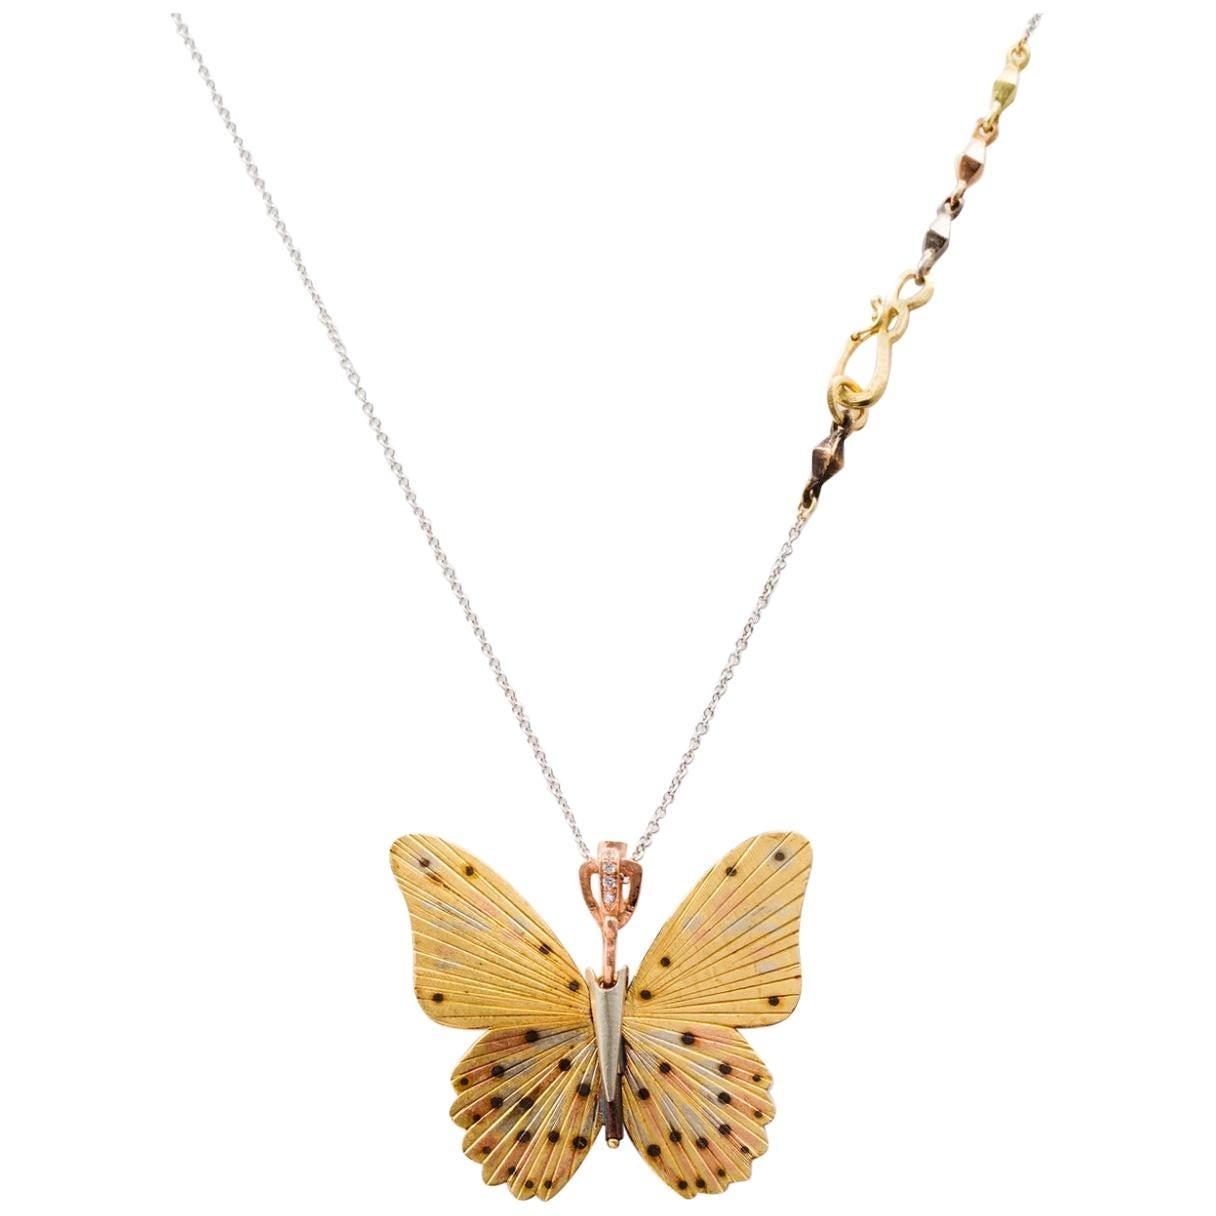 18 Karat Large Troides Helena Butterfly Hinge Necklace